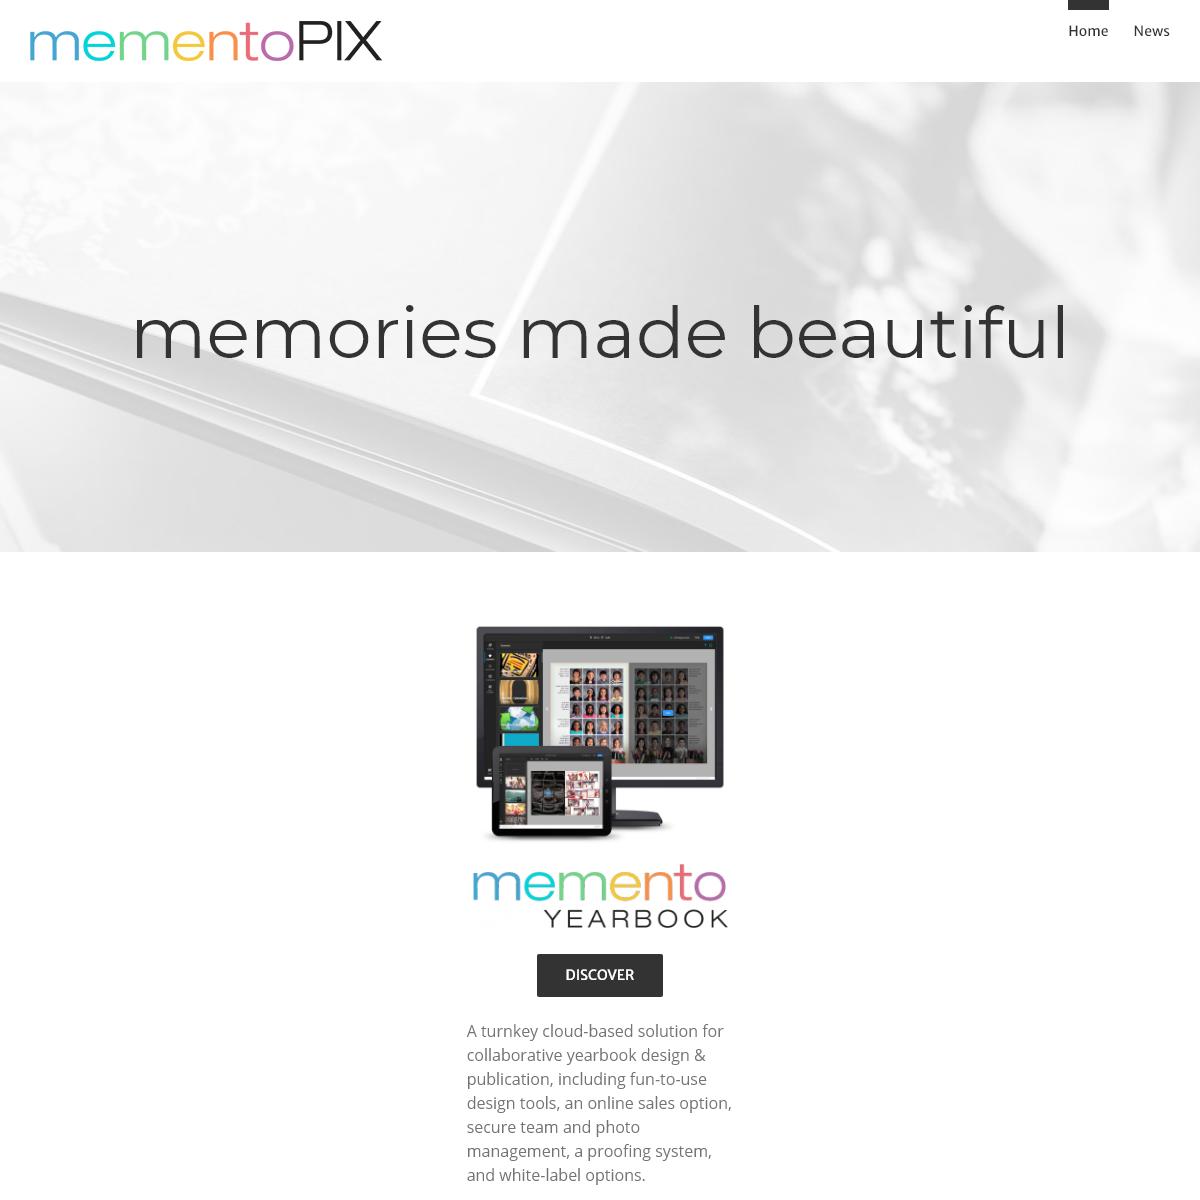 MementoPix – memories made beautiful